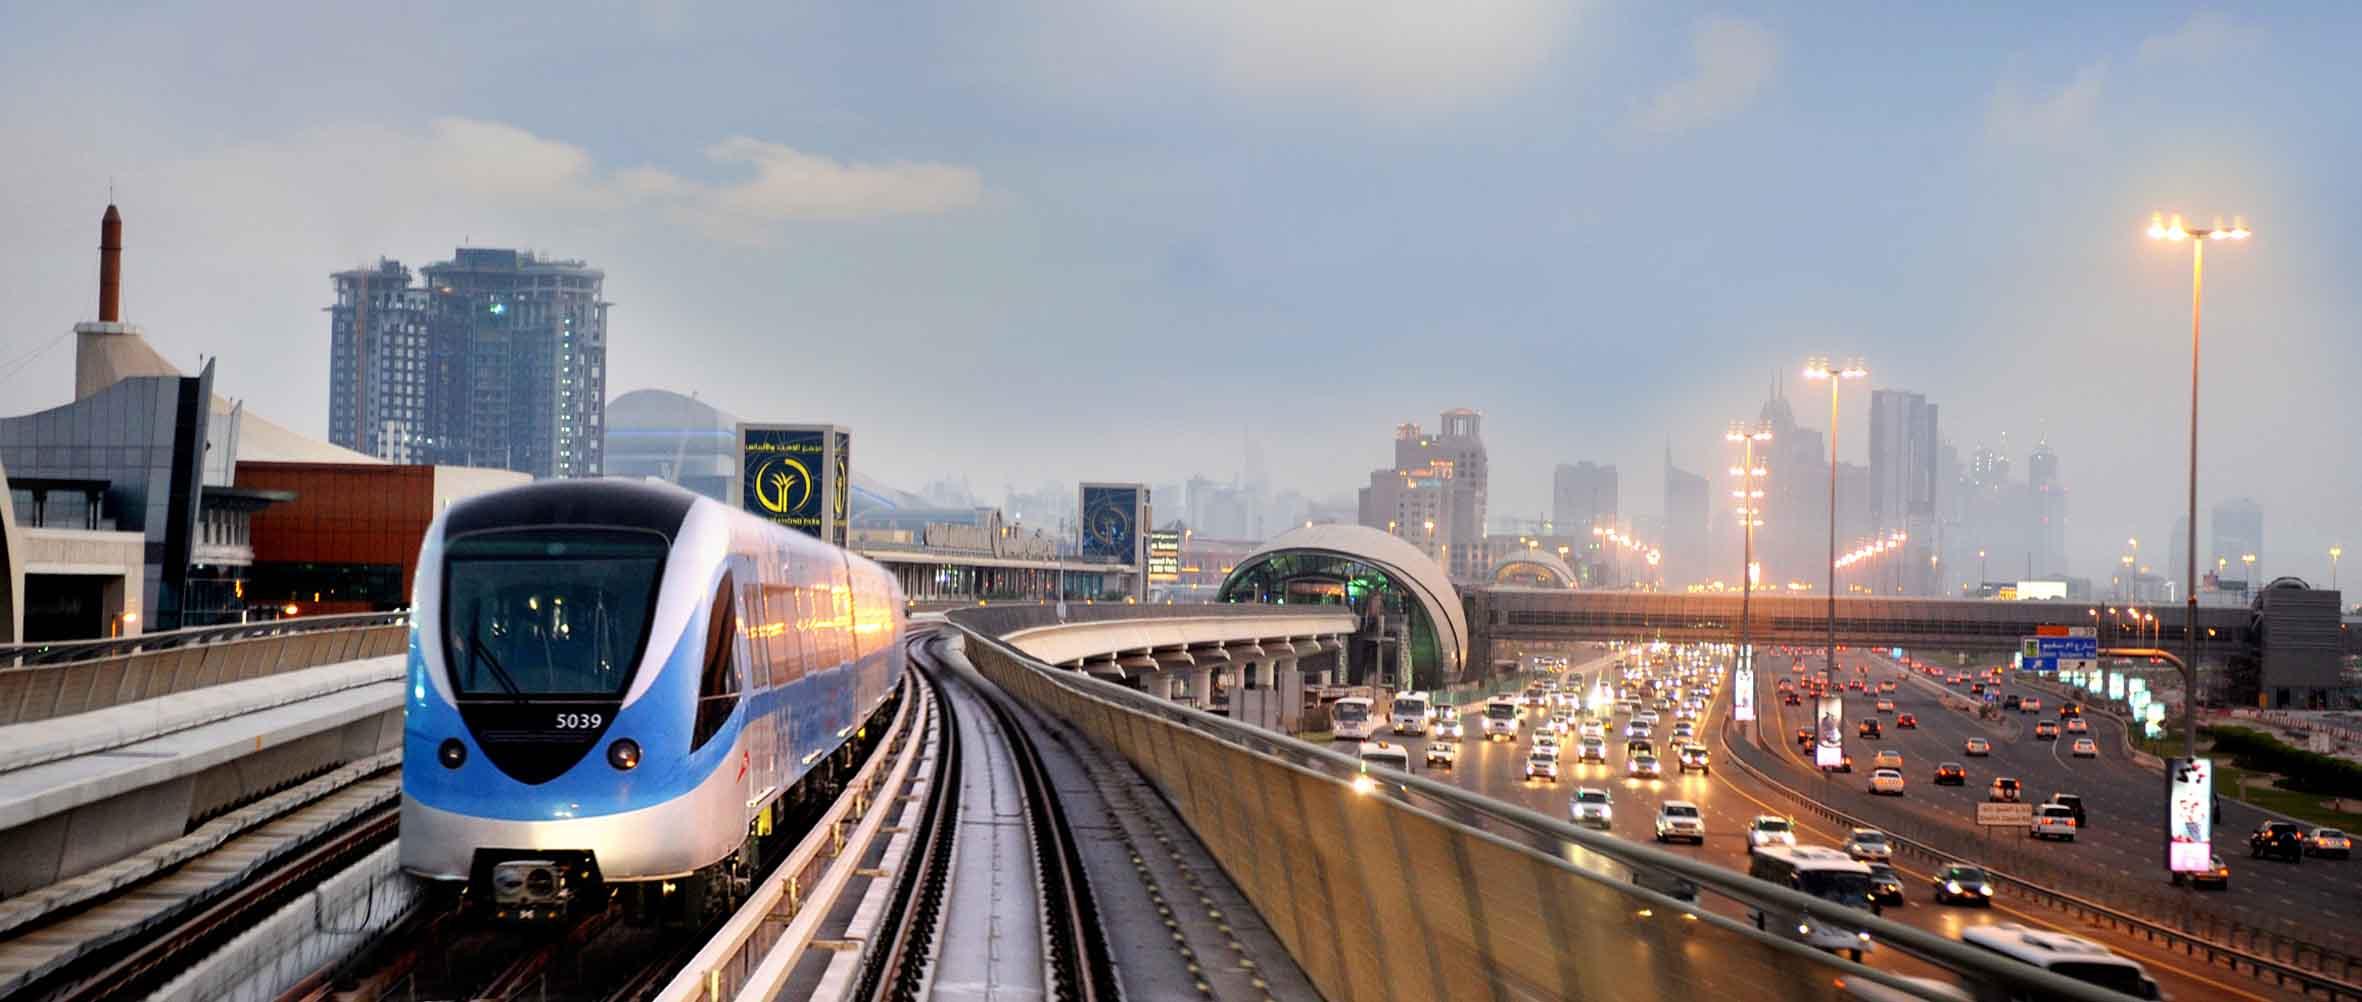 Cheapest Dubai Transportation